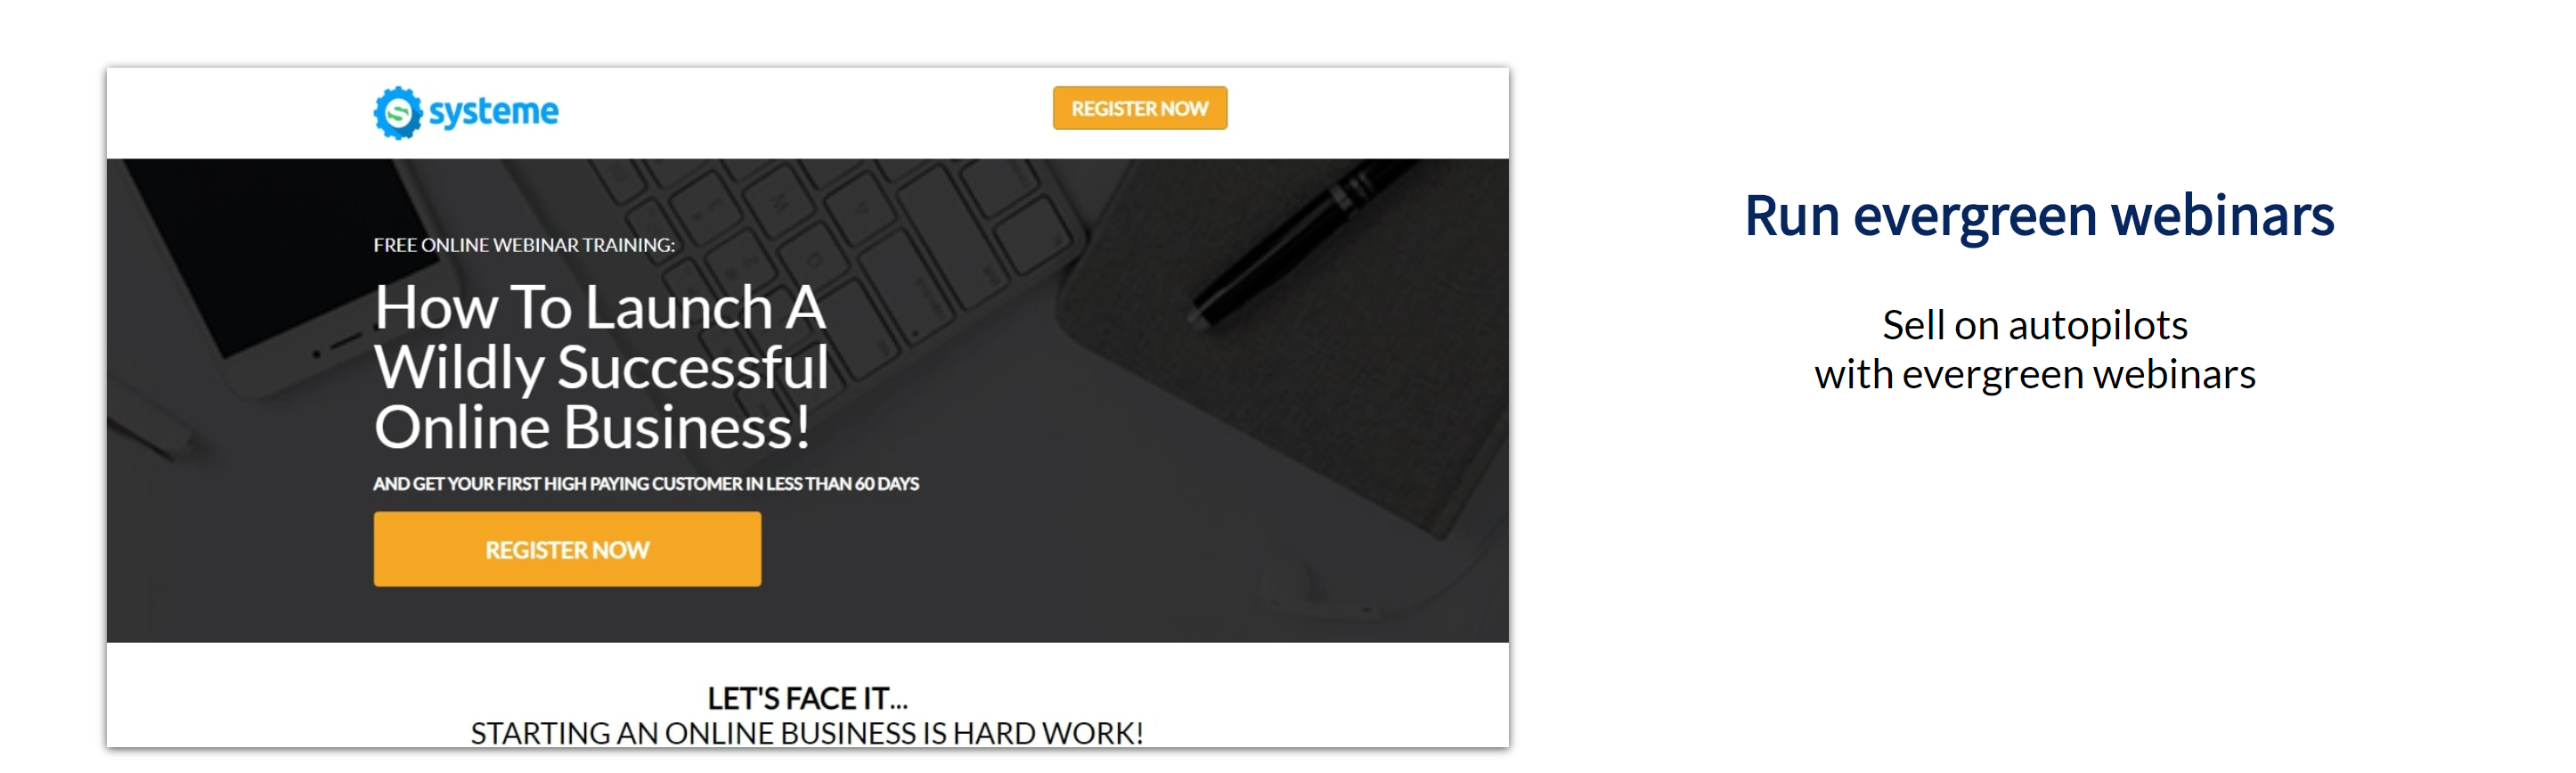 Systeme Reviews Run Webinars Online